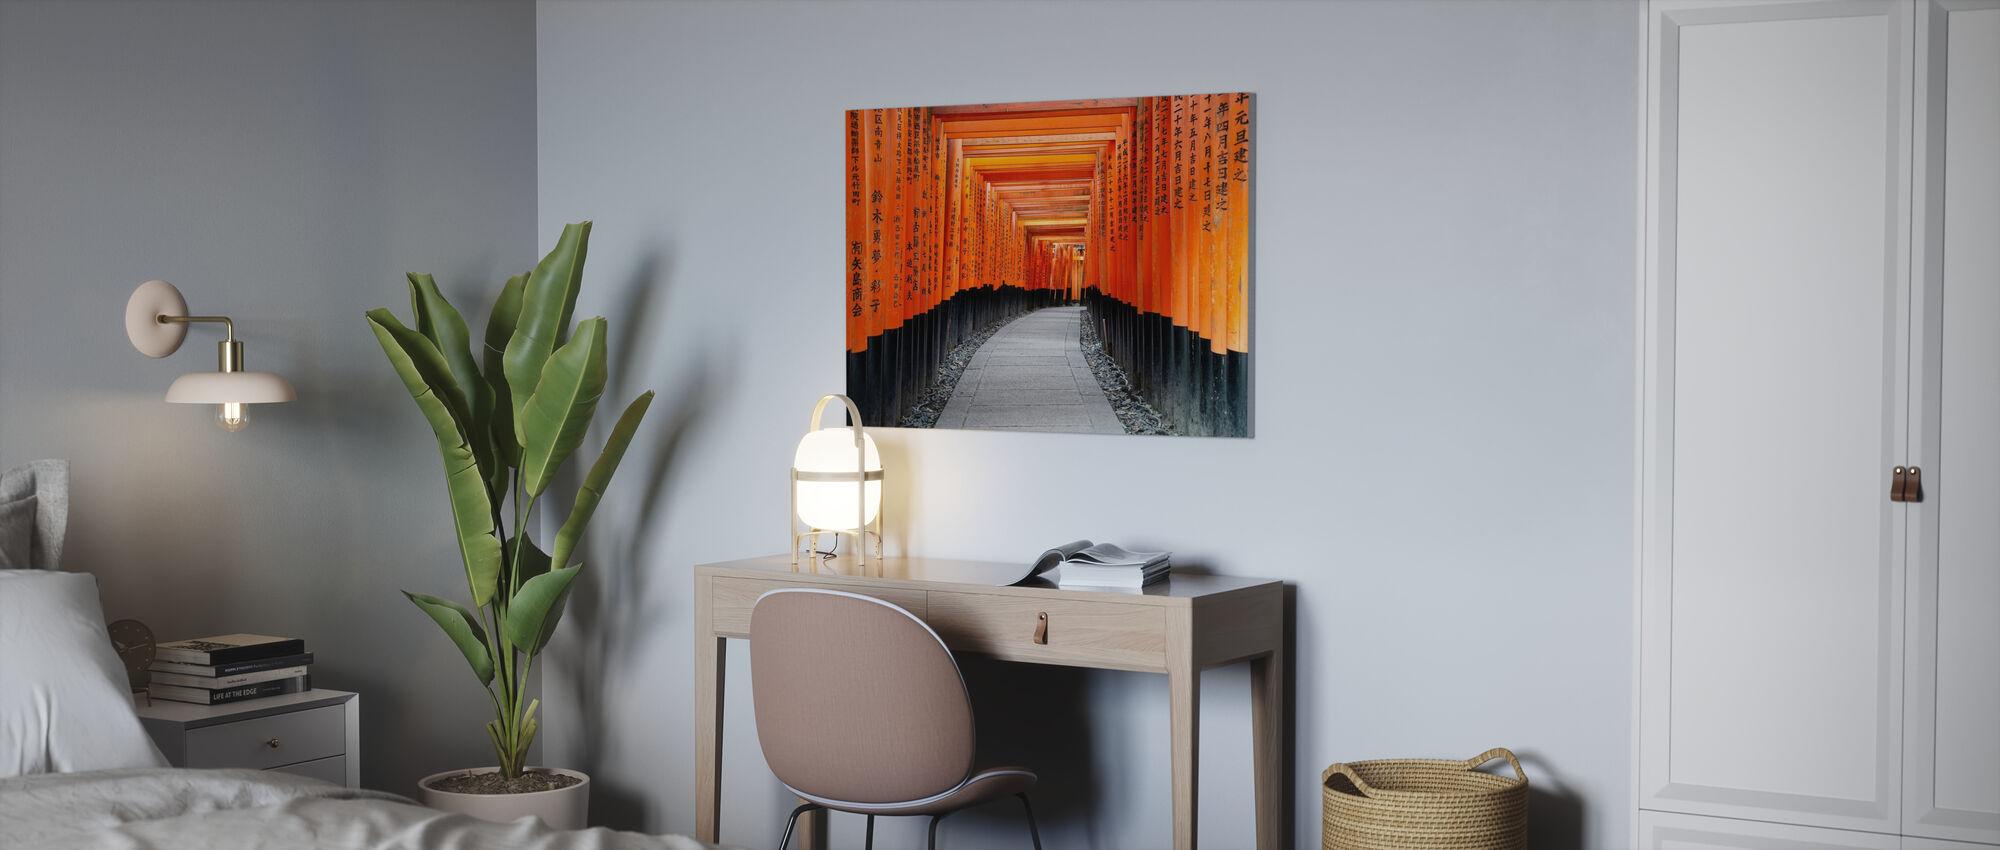 Japan Rising Sun - Torii Gates - Canvas print - Office